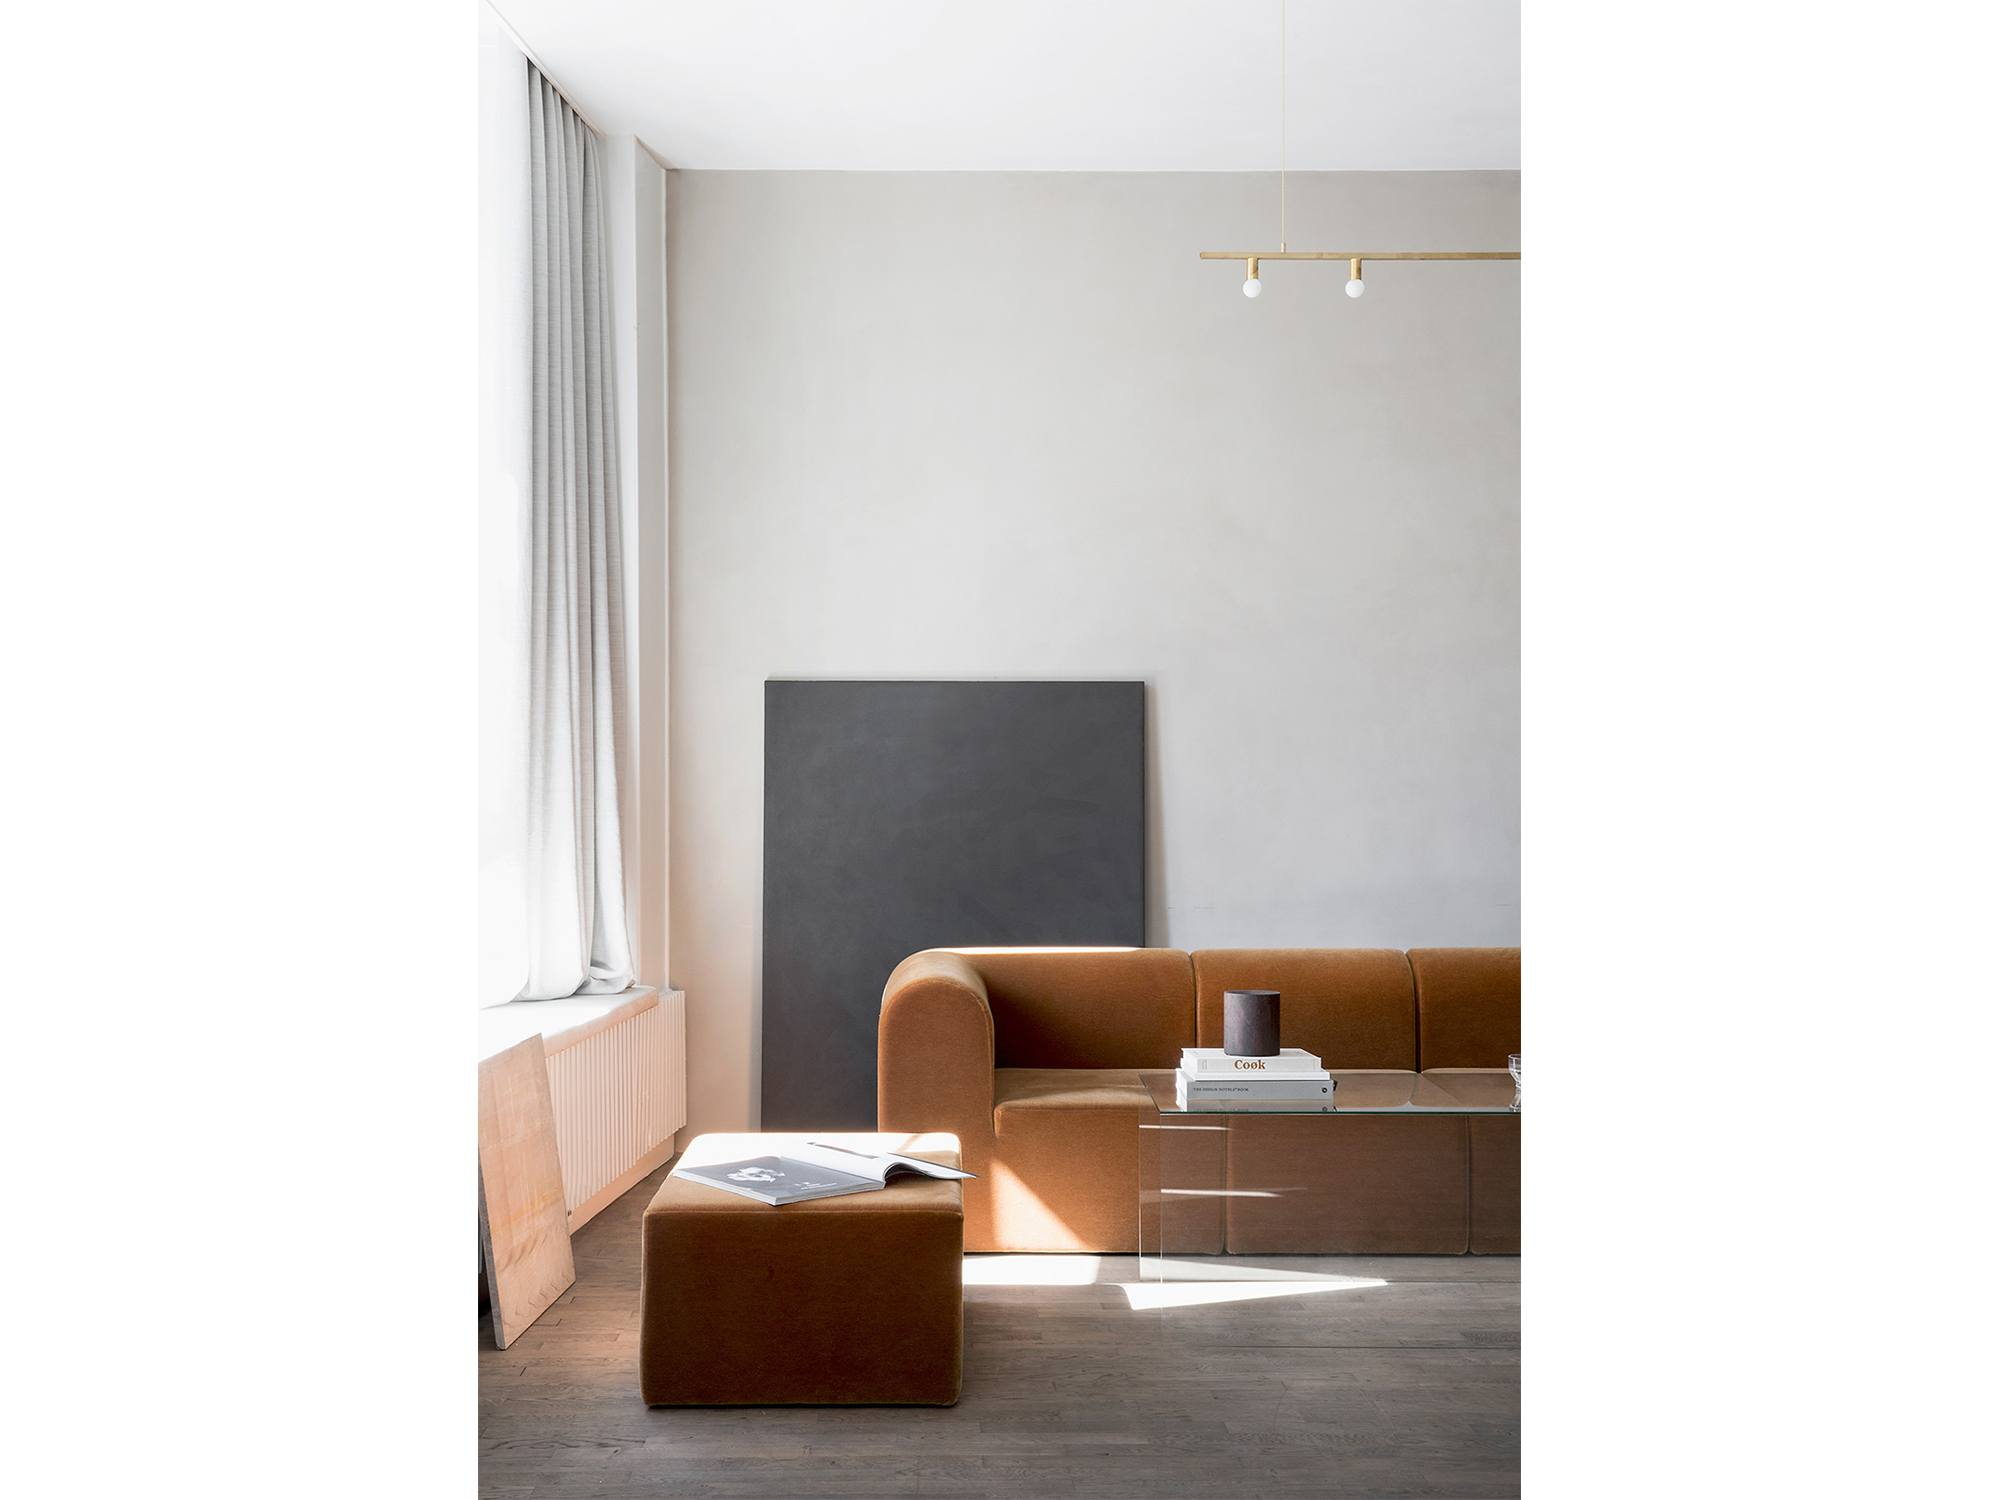 ignant-jonas-bjerre-poulsen-work-06